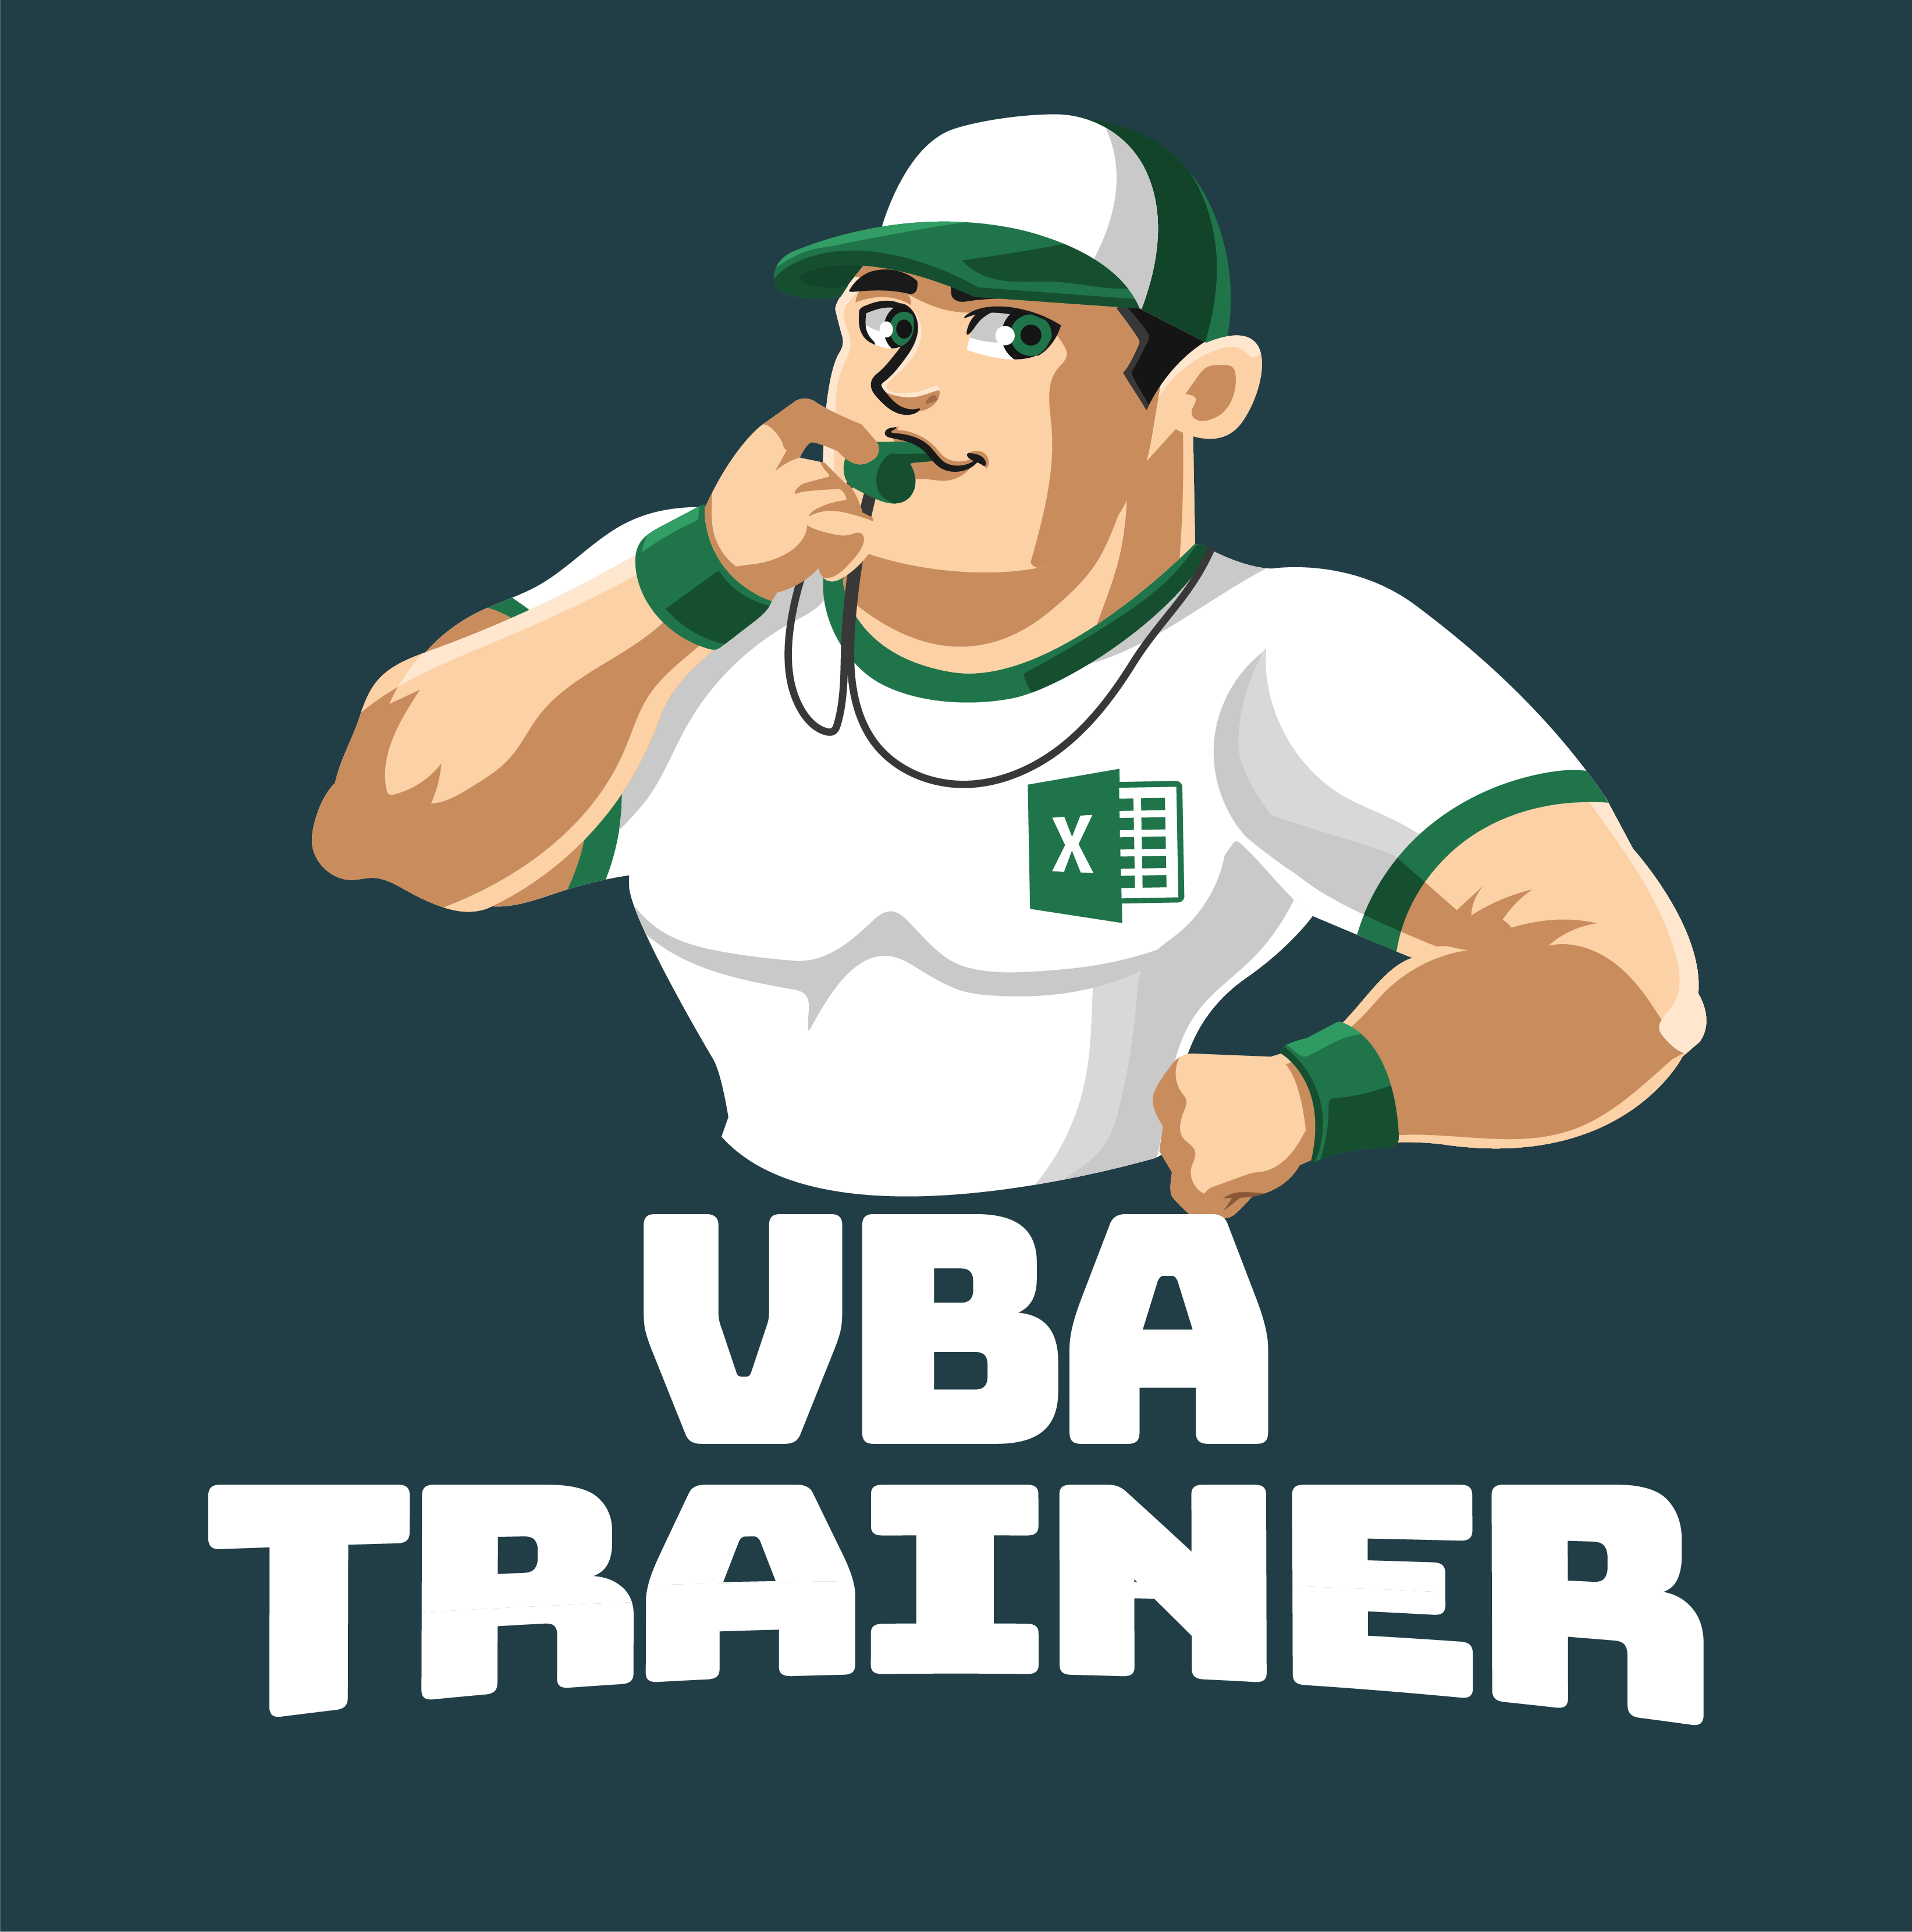 VBATrainer Excel VBA Coaching - VBA Trainer